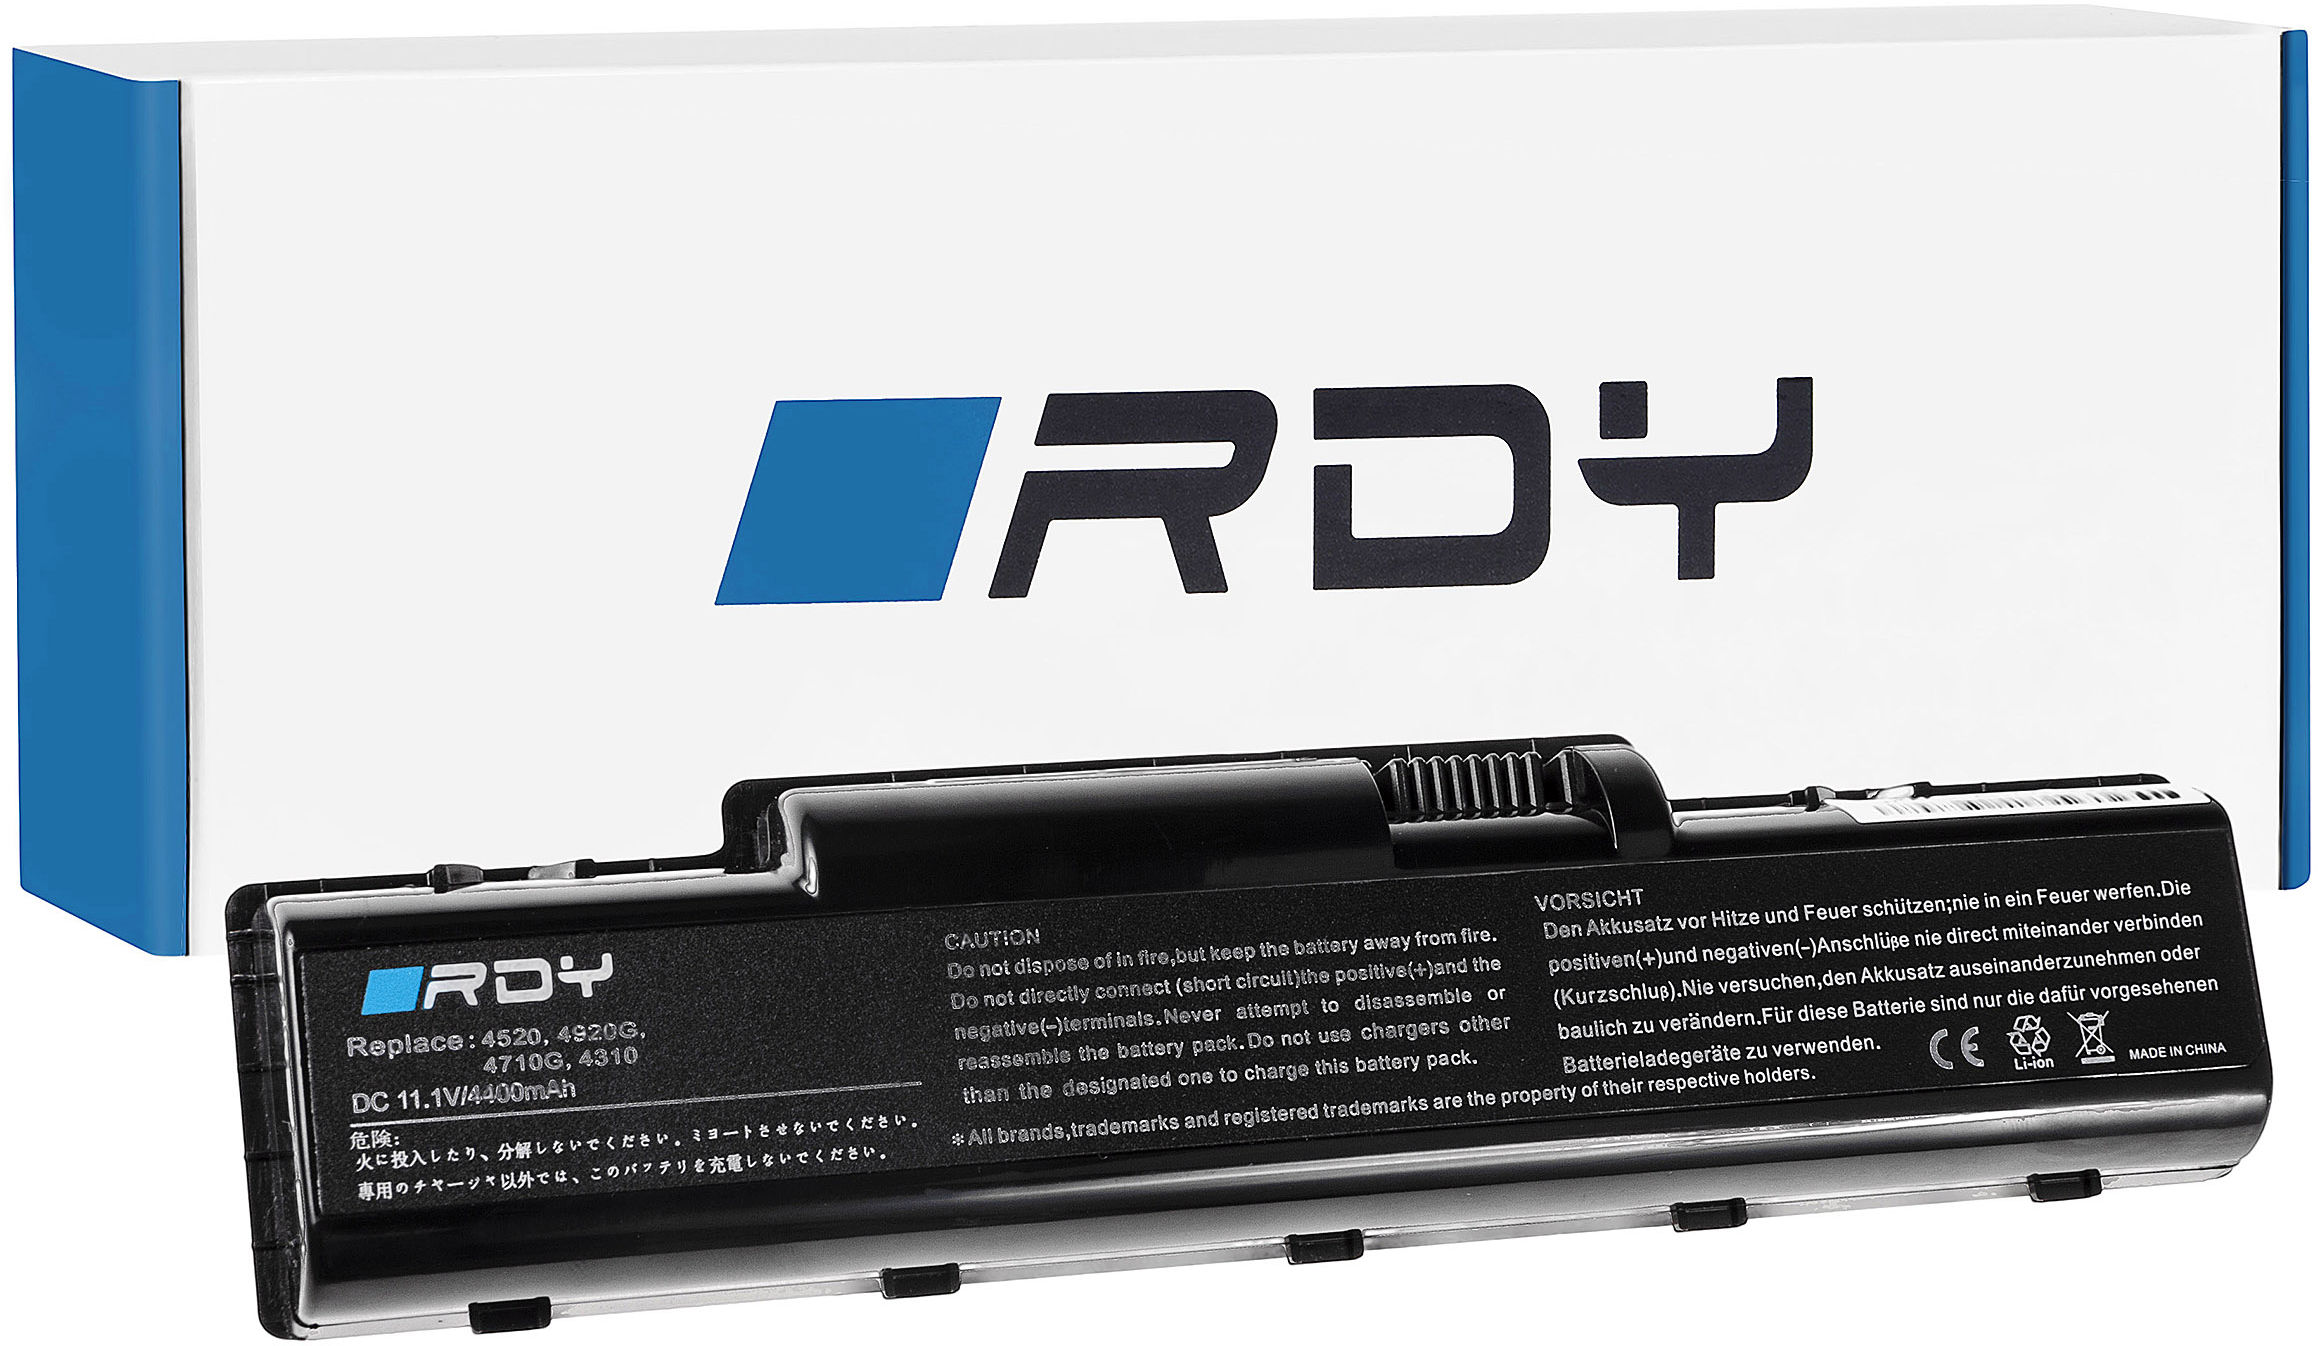 Bateria RDY AS07A31 AS07A41 AS07A51 do Acer Aspire 5535 5356 5735 5735Z 5737Z 5738 5740 5740G